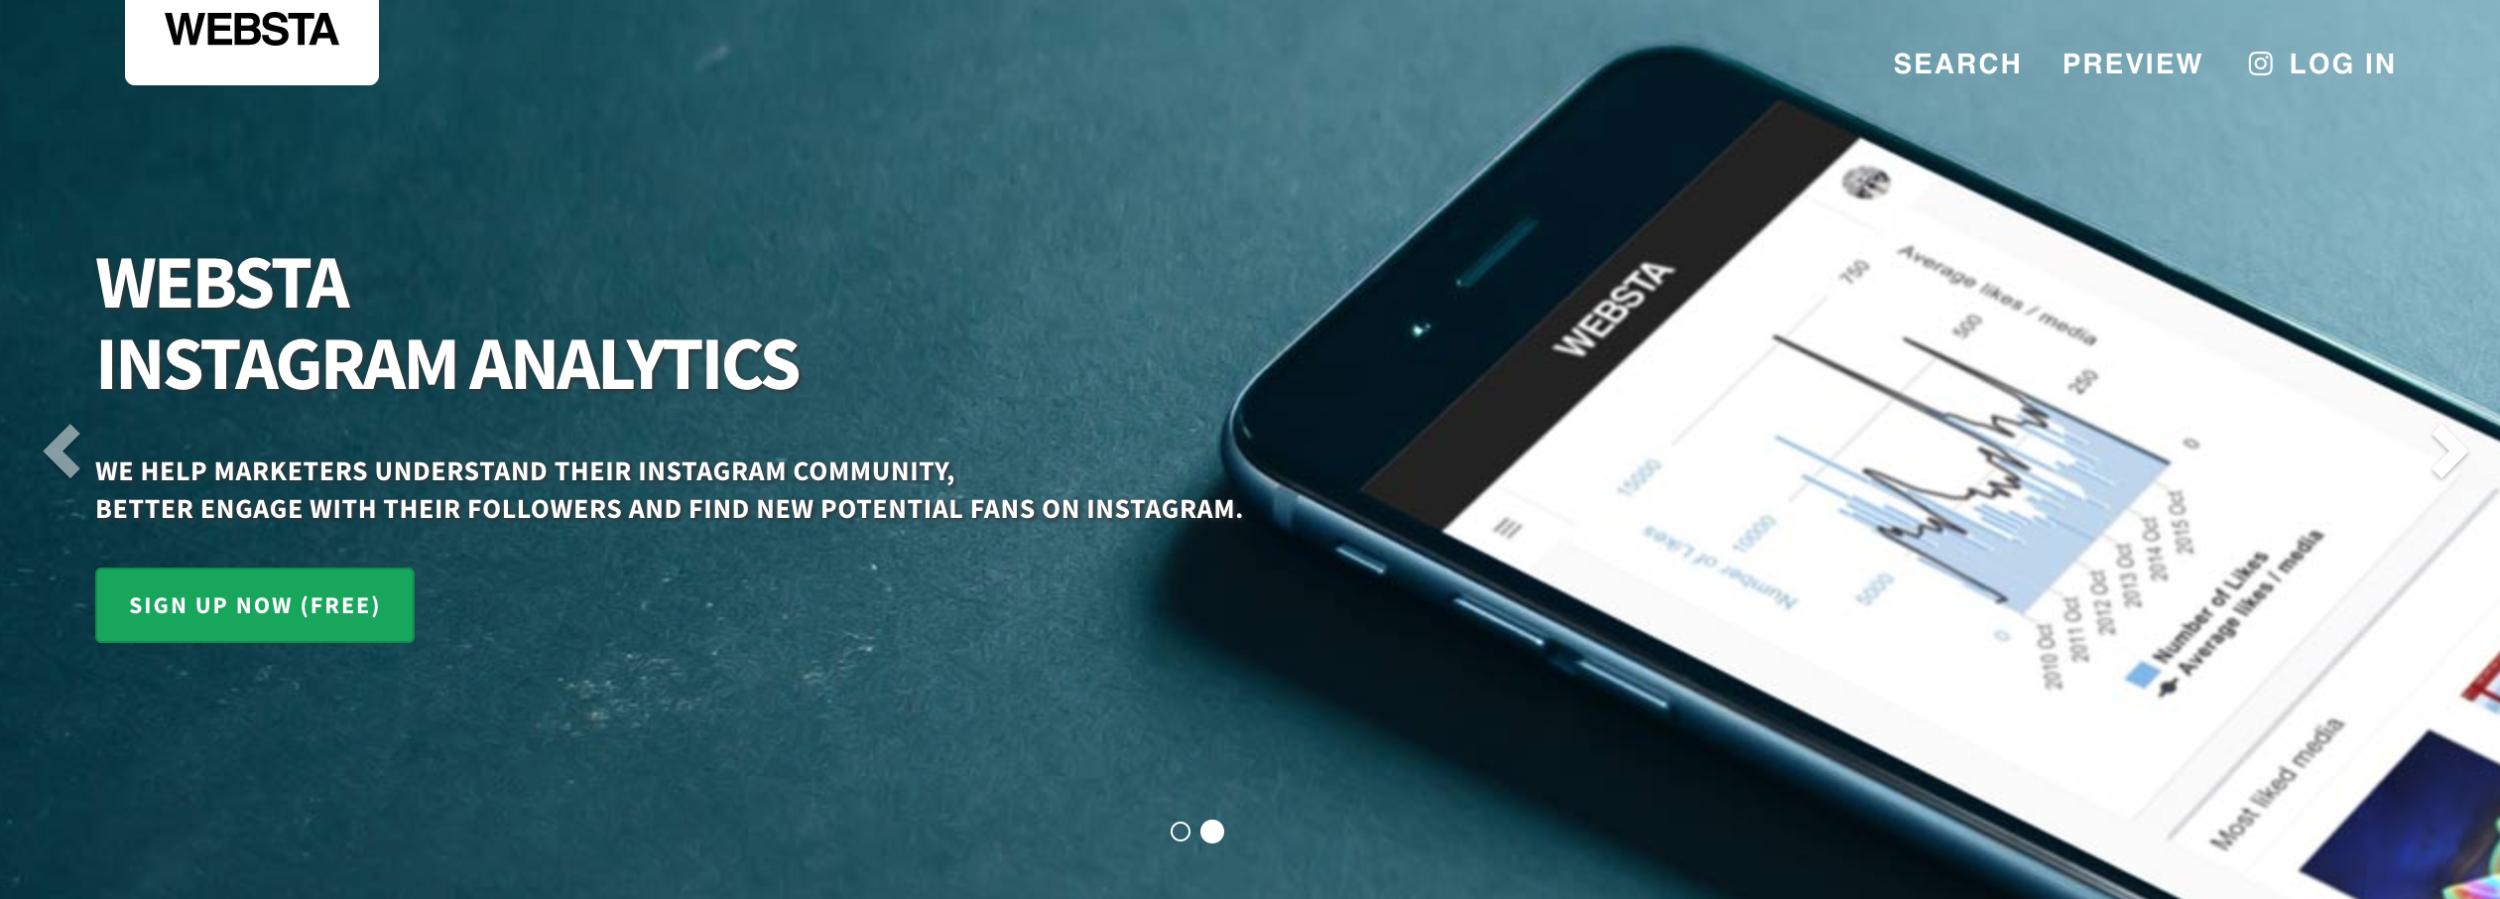 websta - instagram analytics tools